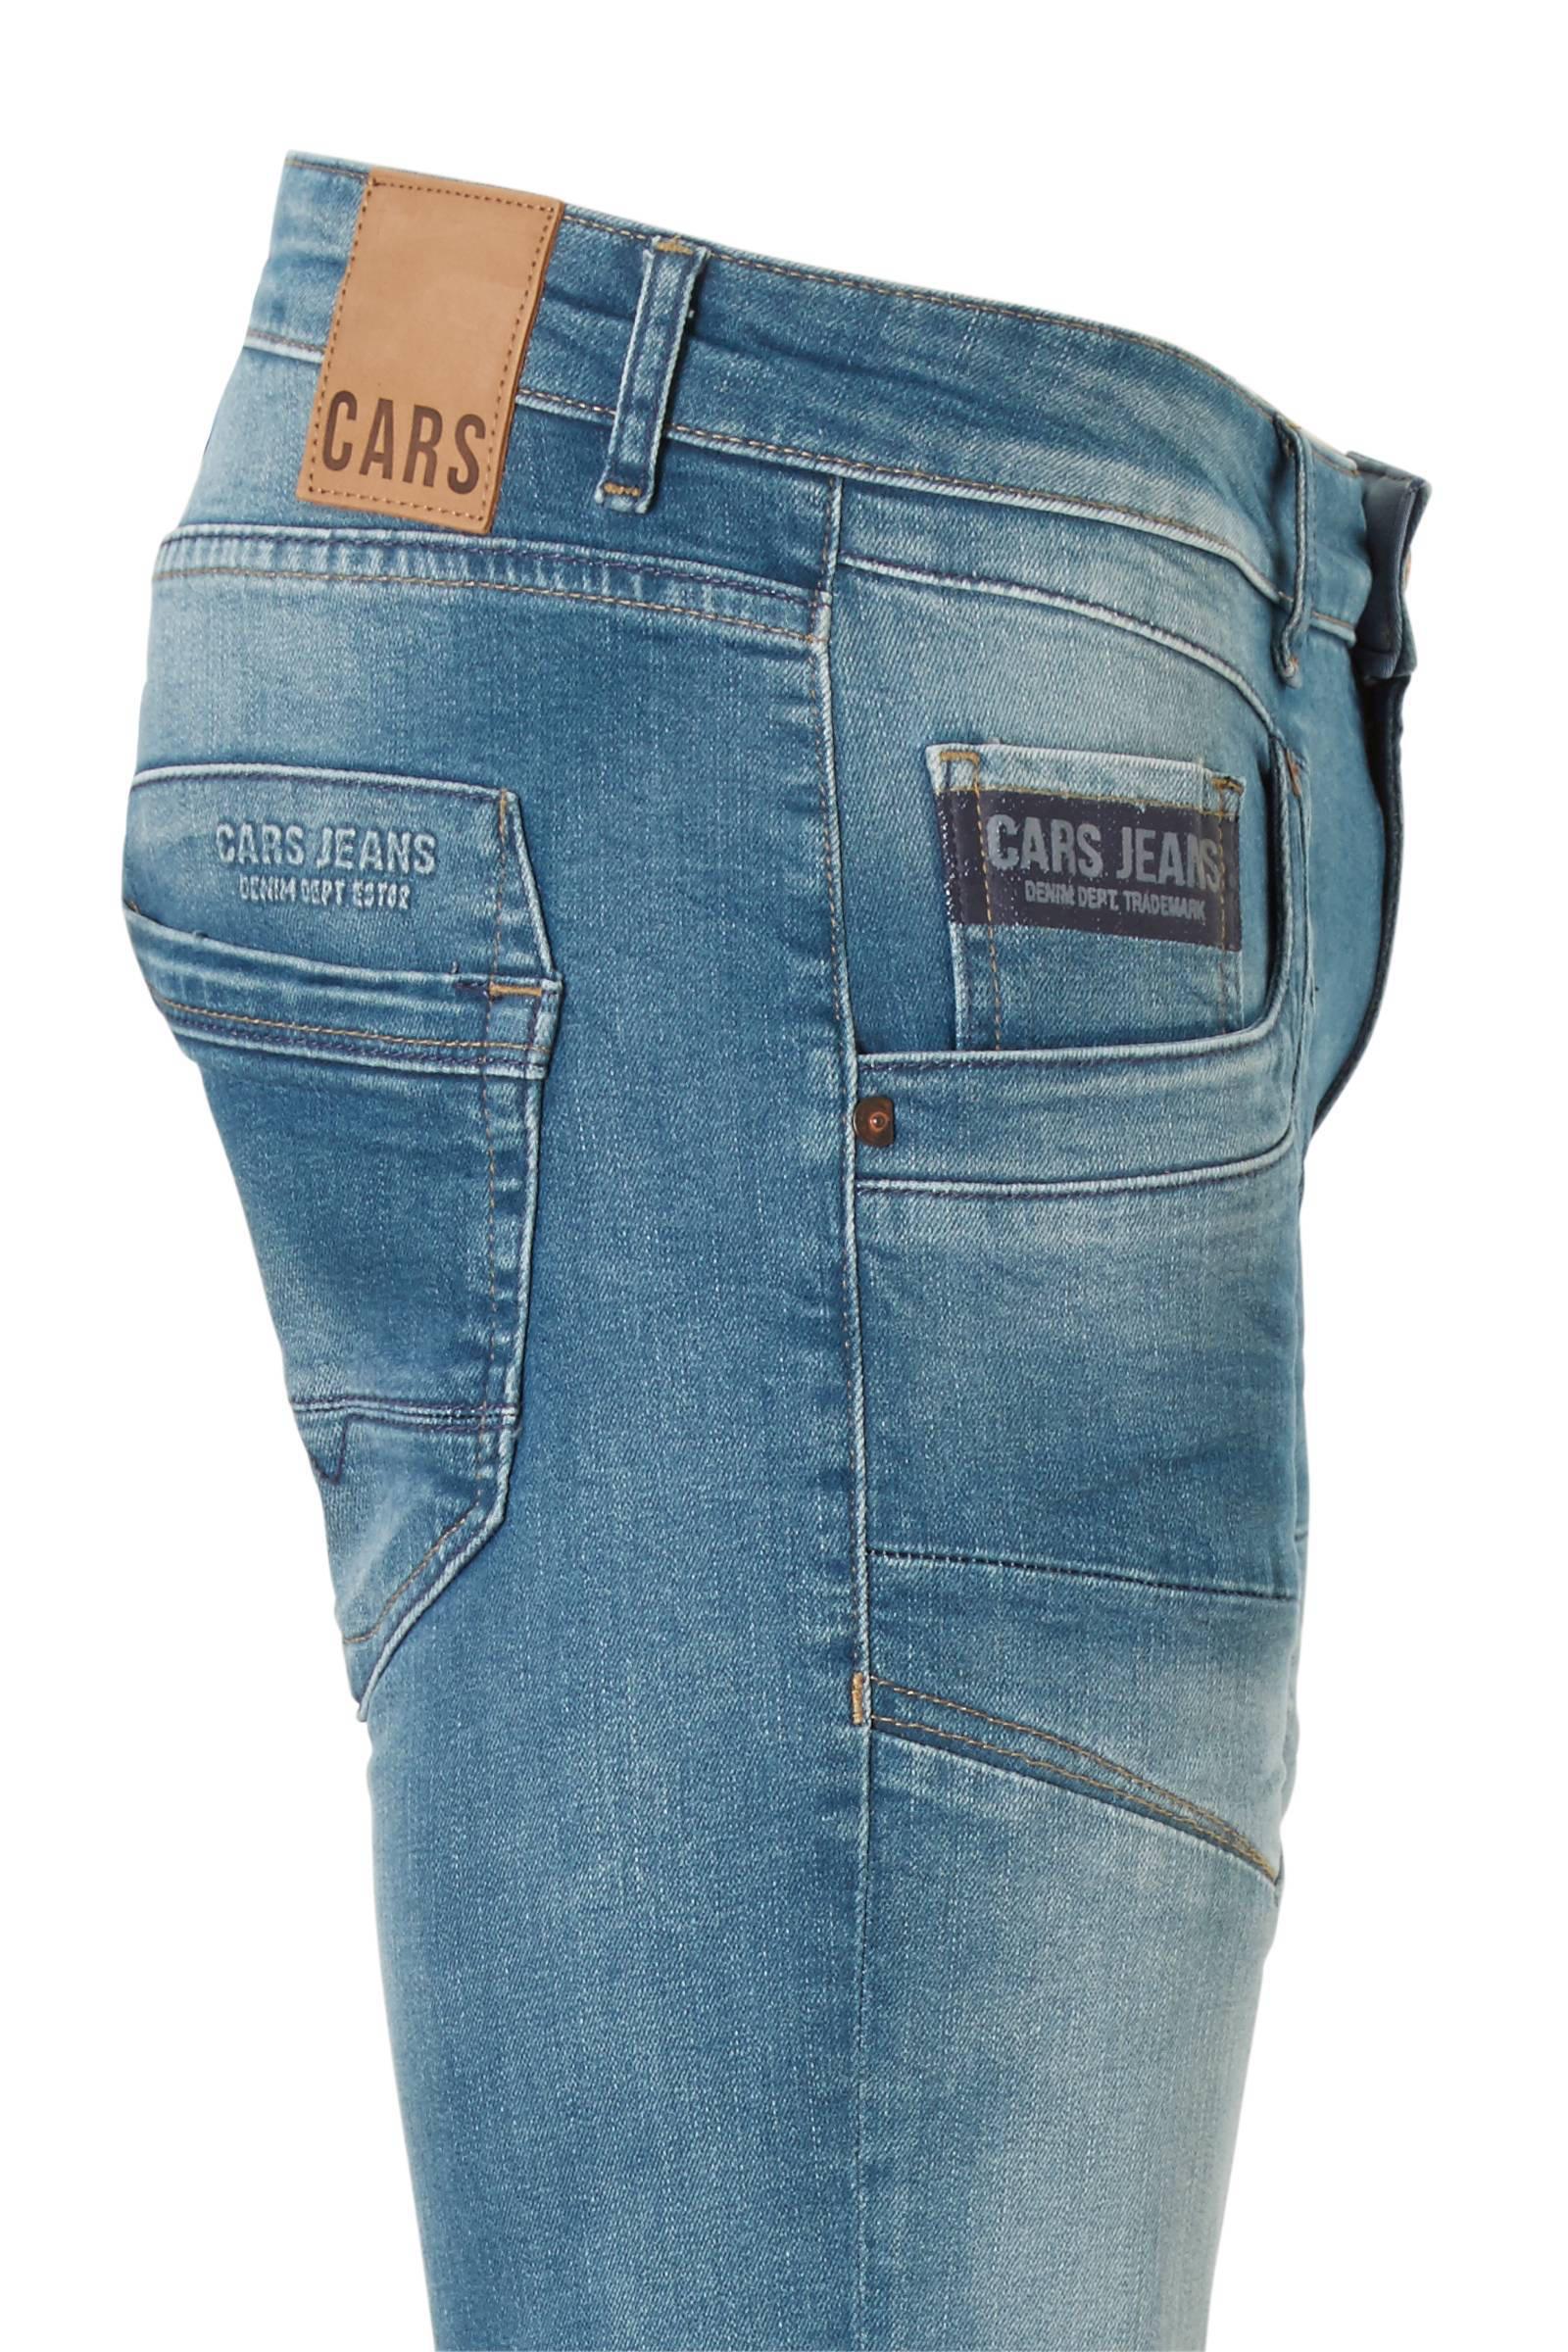 Cars slim fit jeans Stockton green cast used   wehkamp